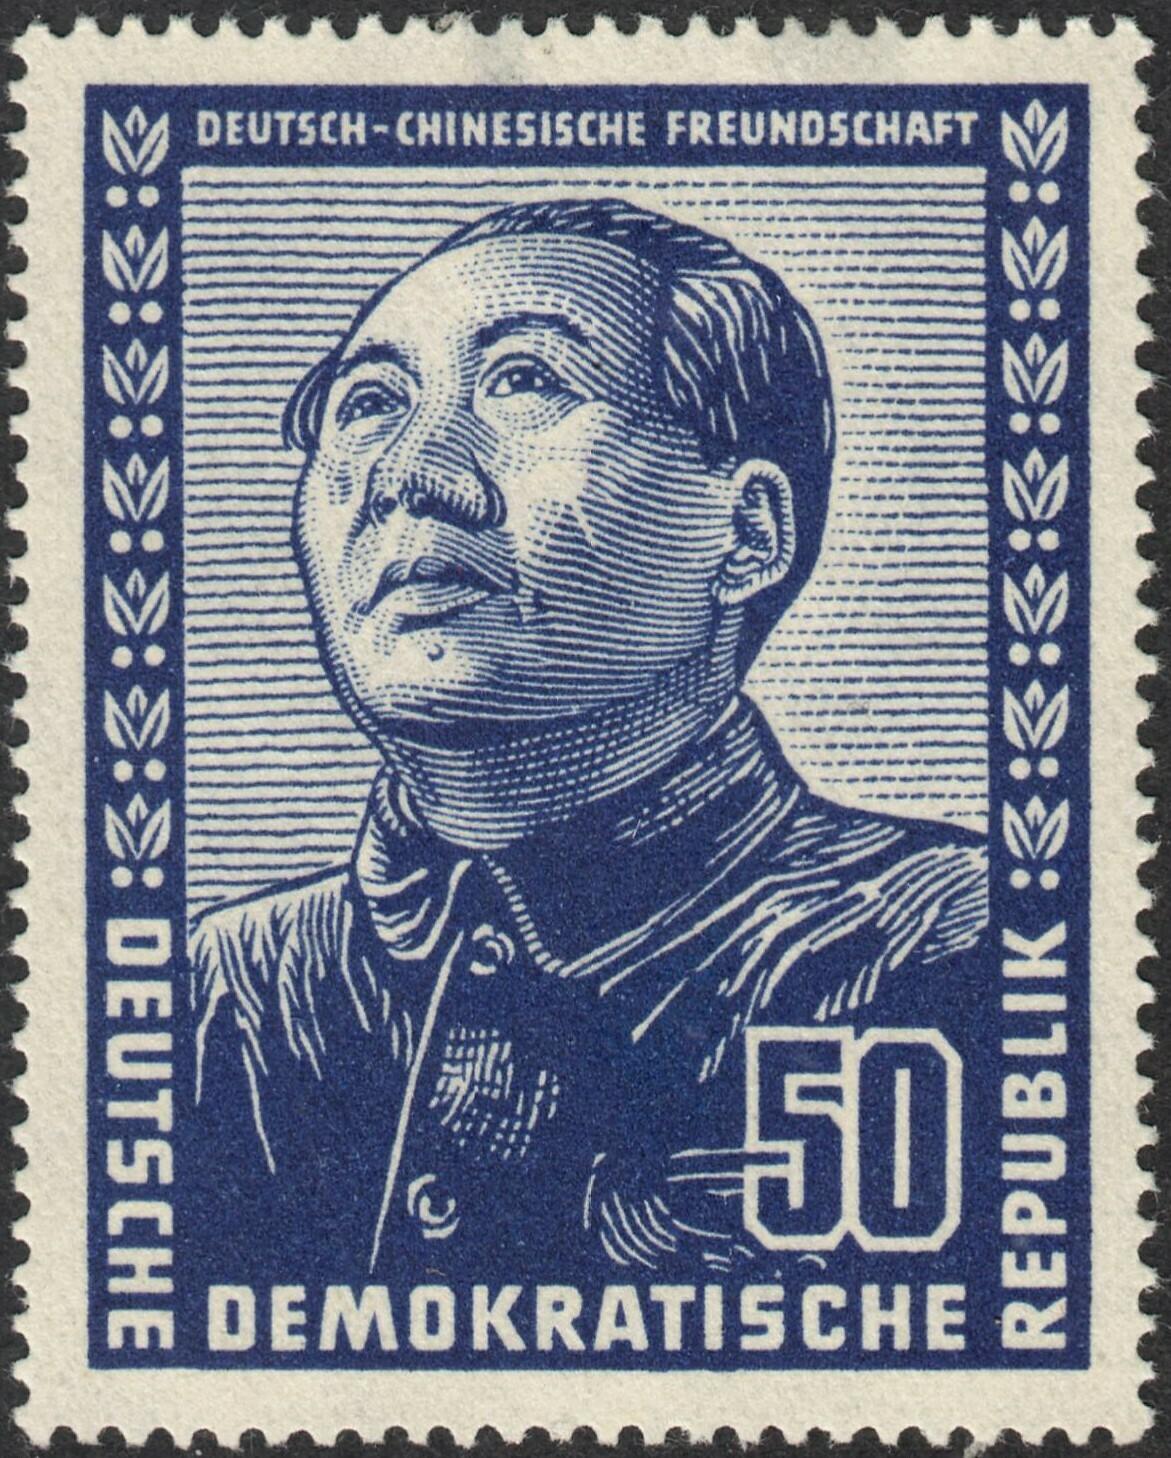 Germany (East) 1951 50pf Blue Friendship with China Mao Tse-Tung MH